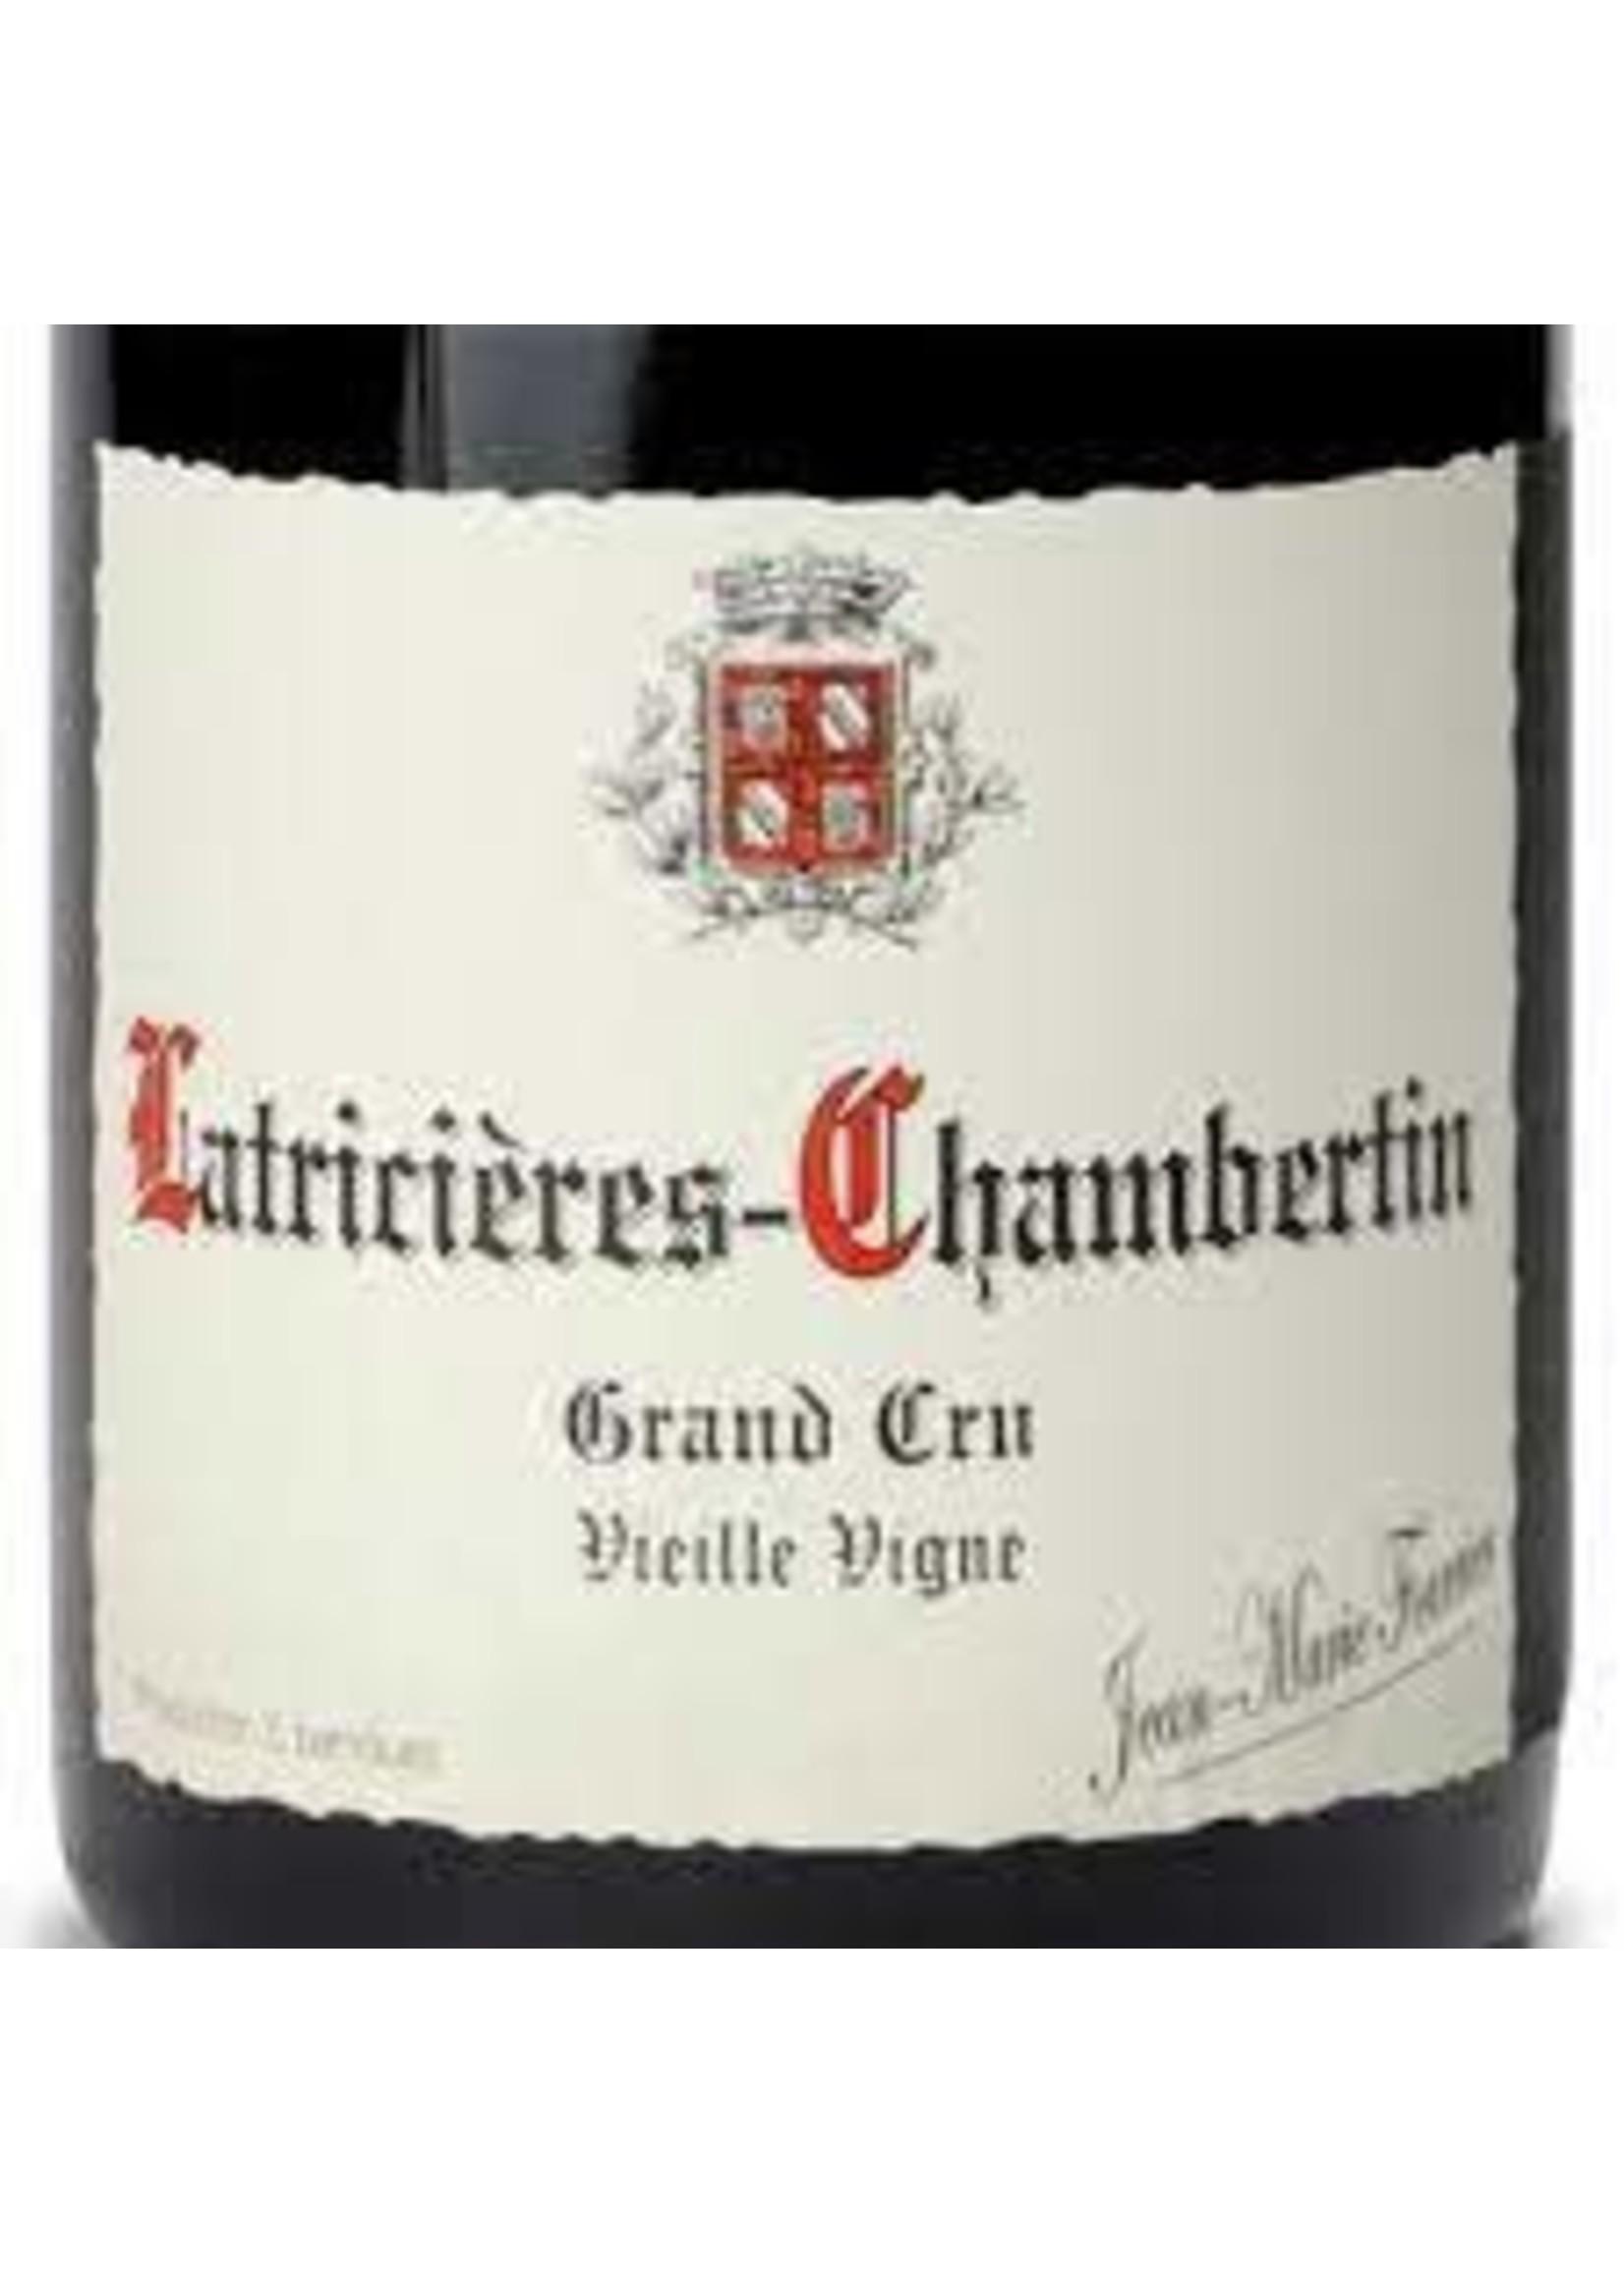 Jean-Marie Fourrier 2015 Latricieres Chambertin Grand Cru 750ml [PRE-ARRIVAL]